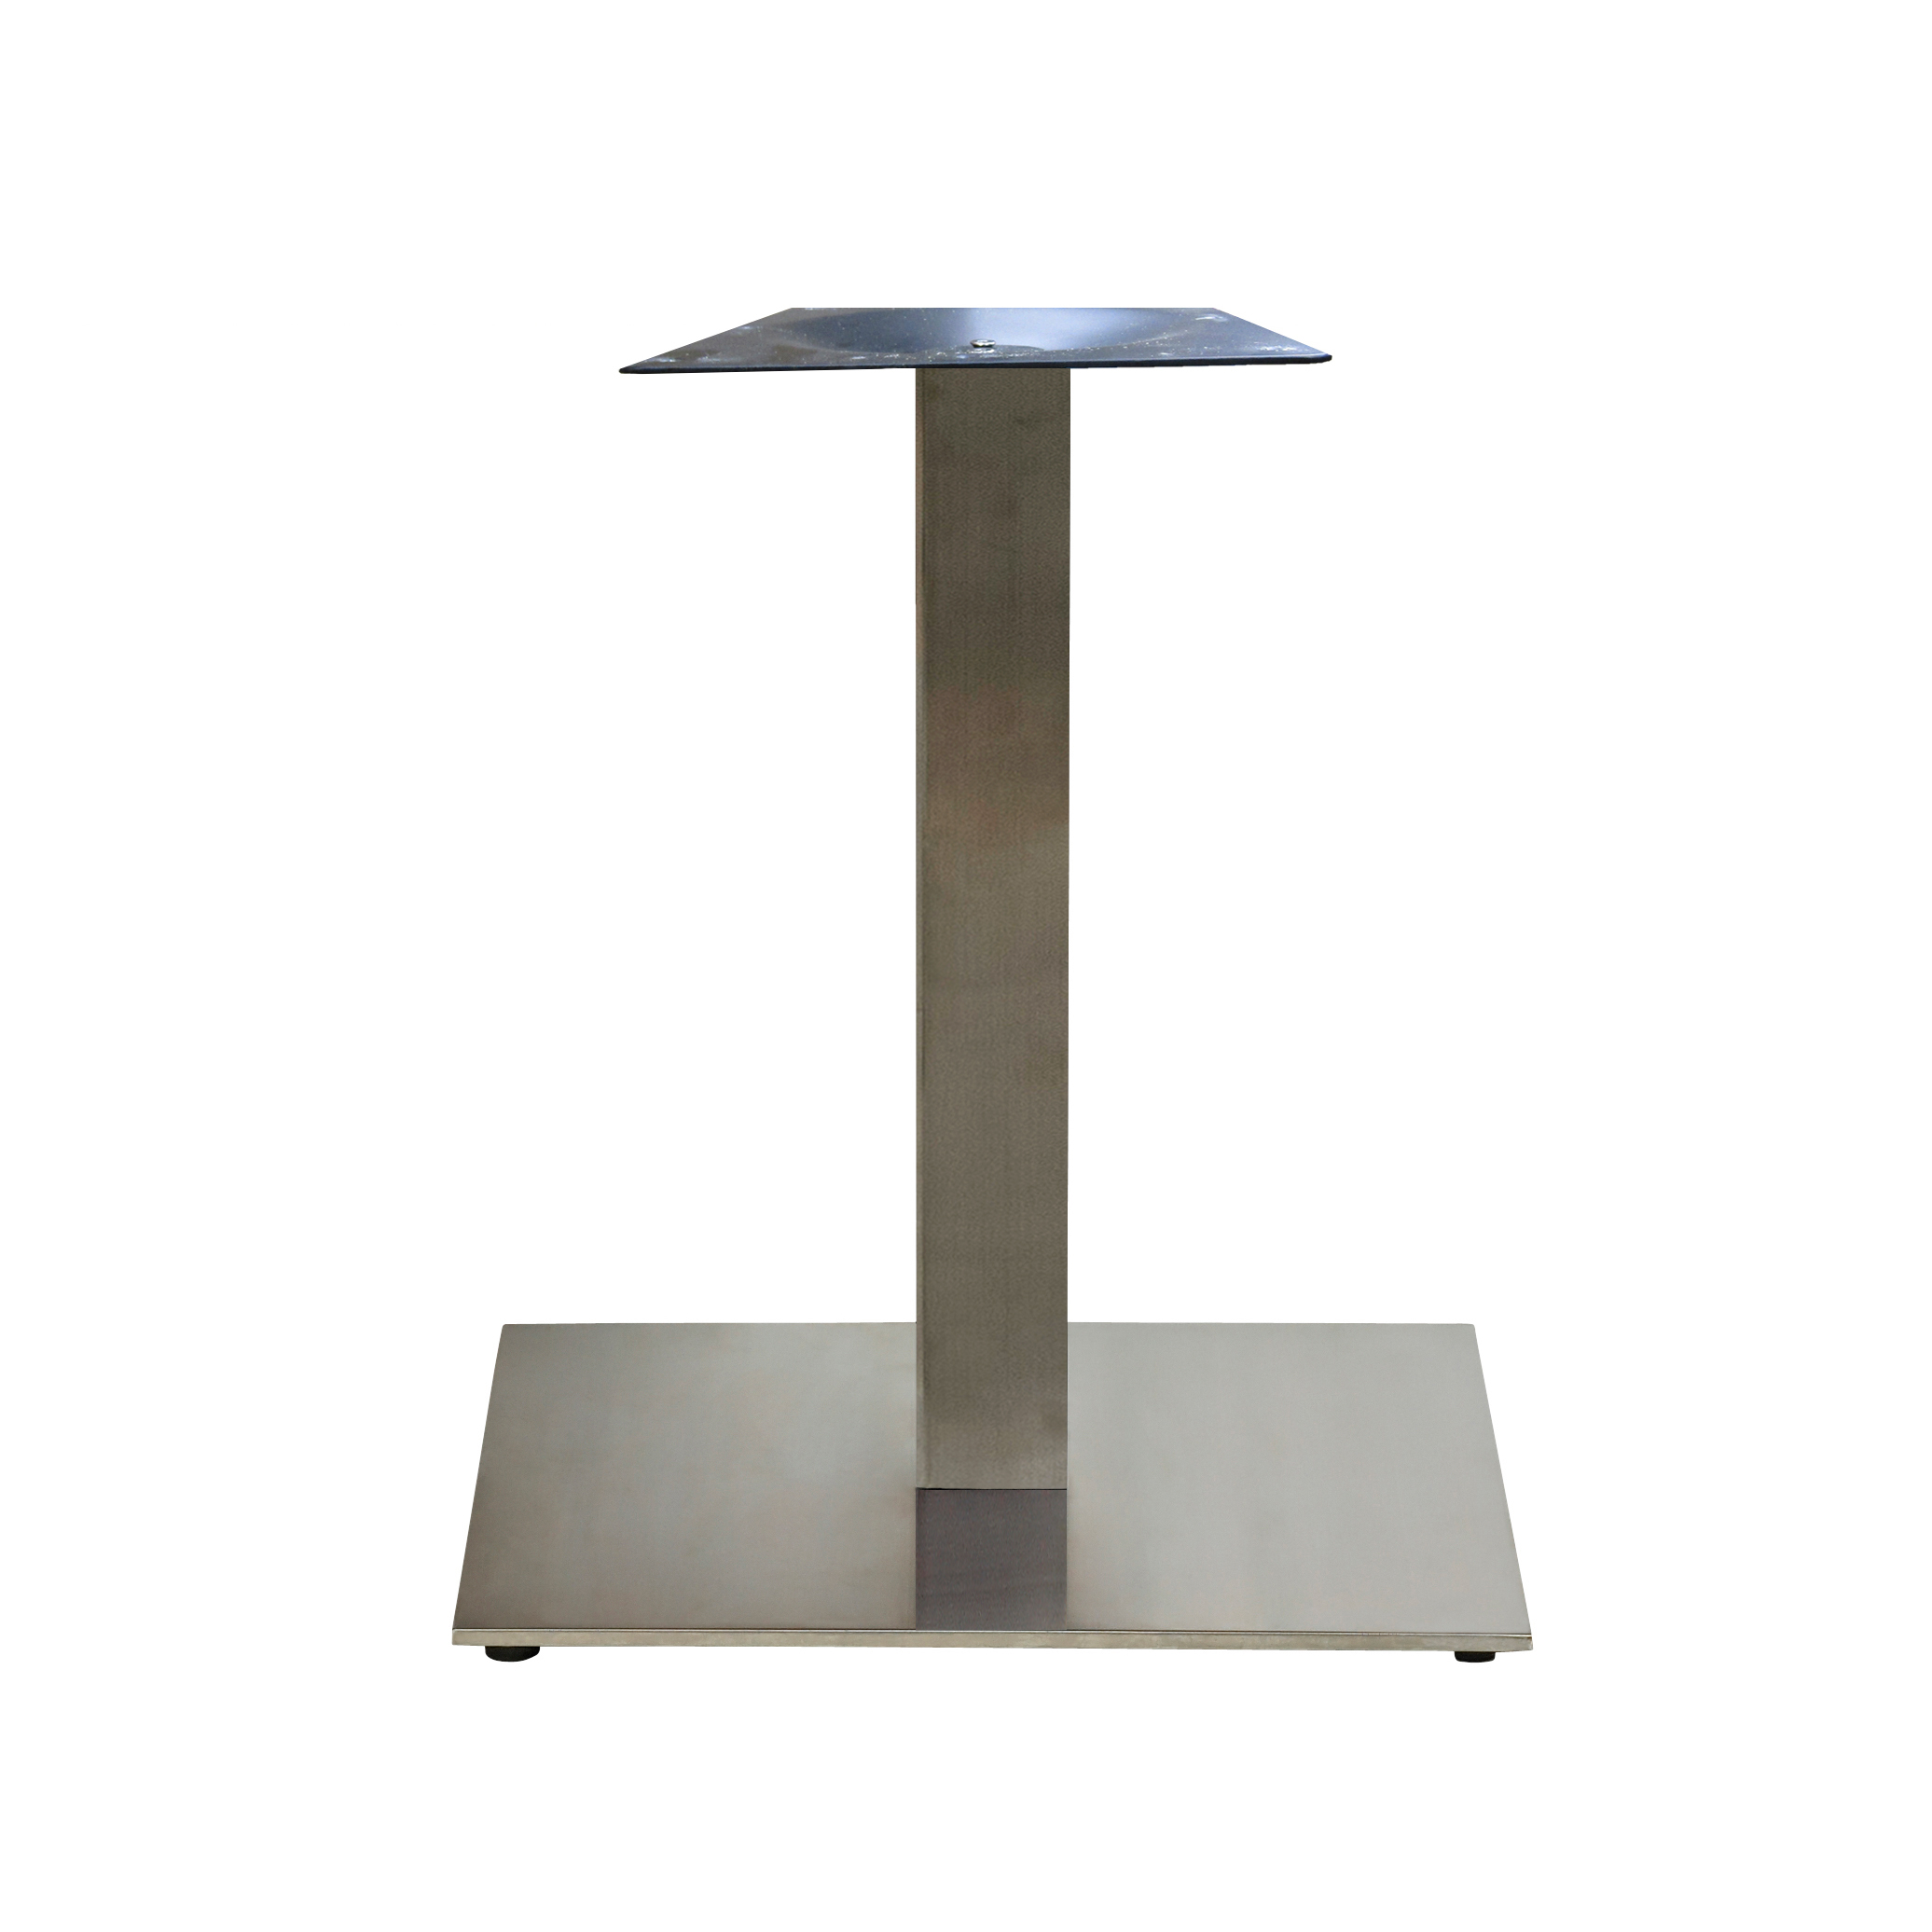 Grosfillex US504009 table base, metal